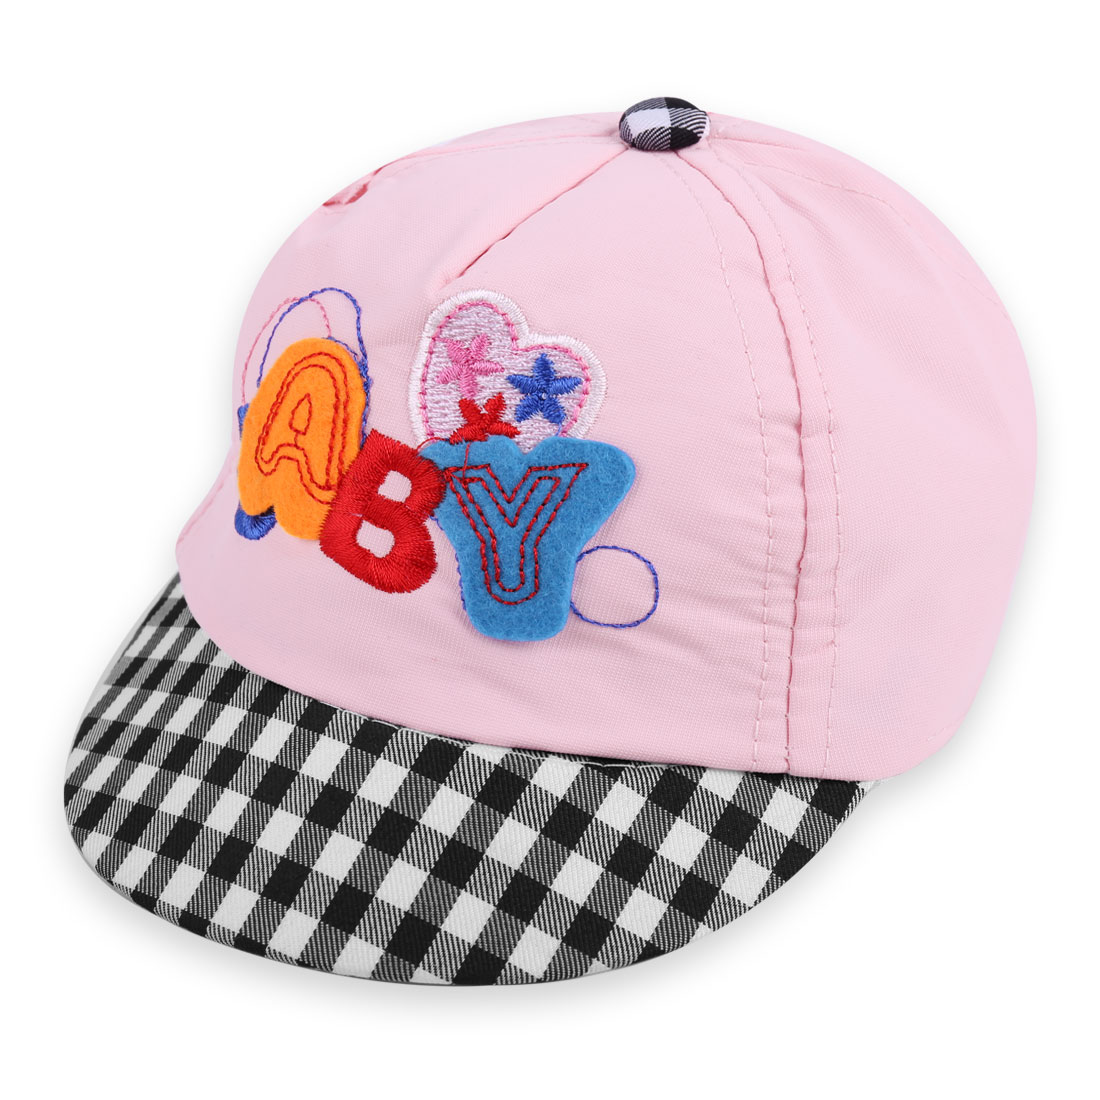 Lovely Light Pink Color Embroidered Letters Embellished Visor Cap for Baby